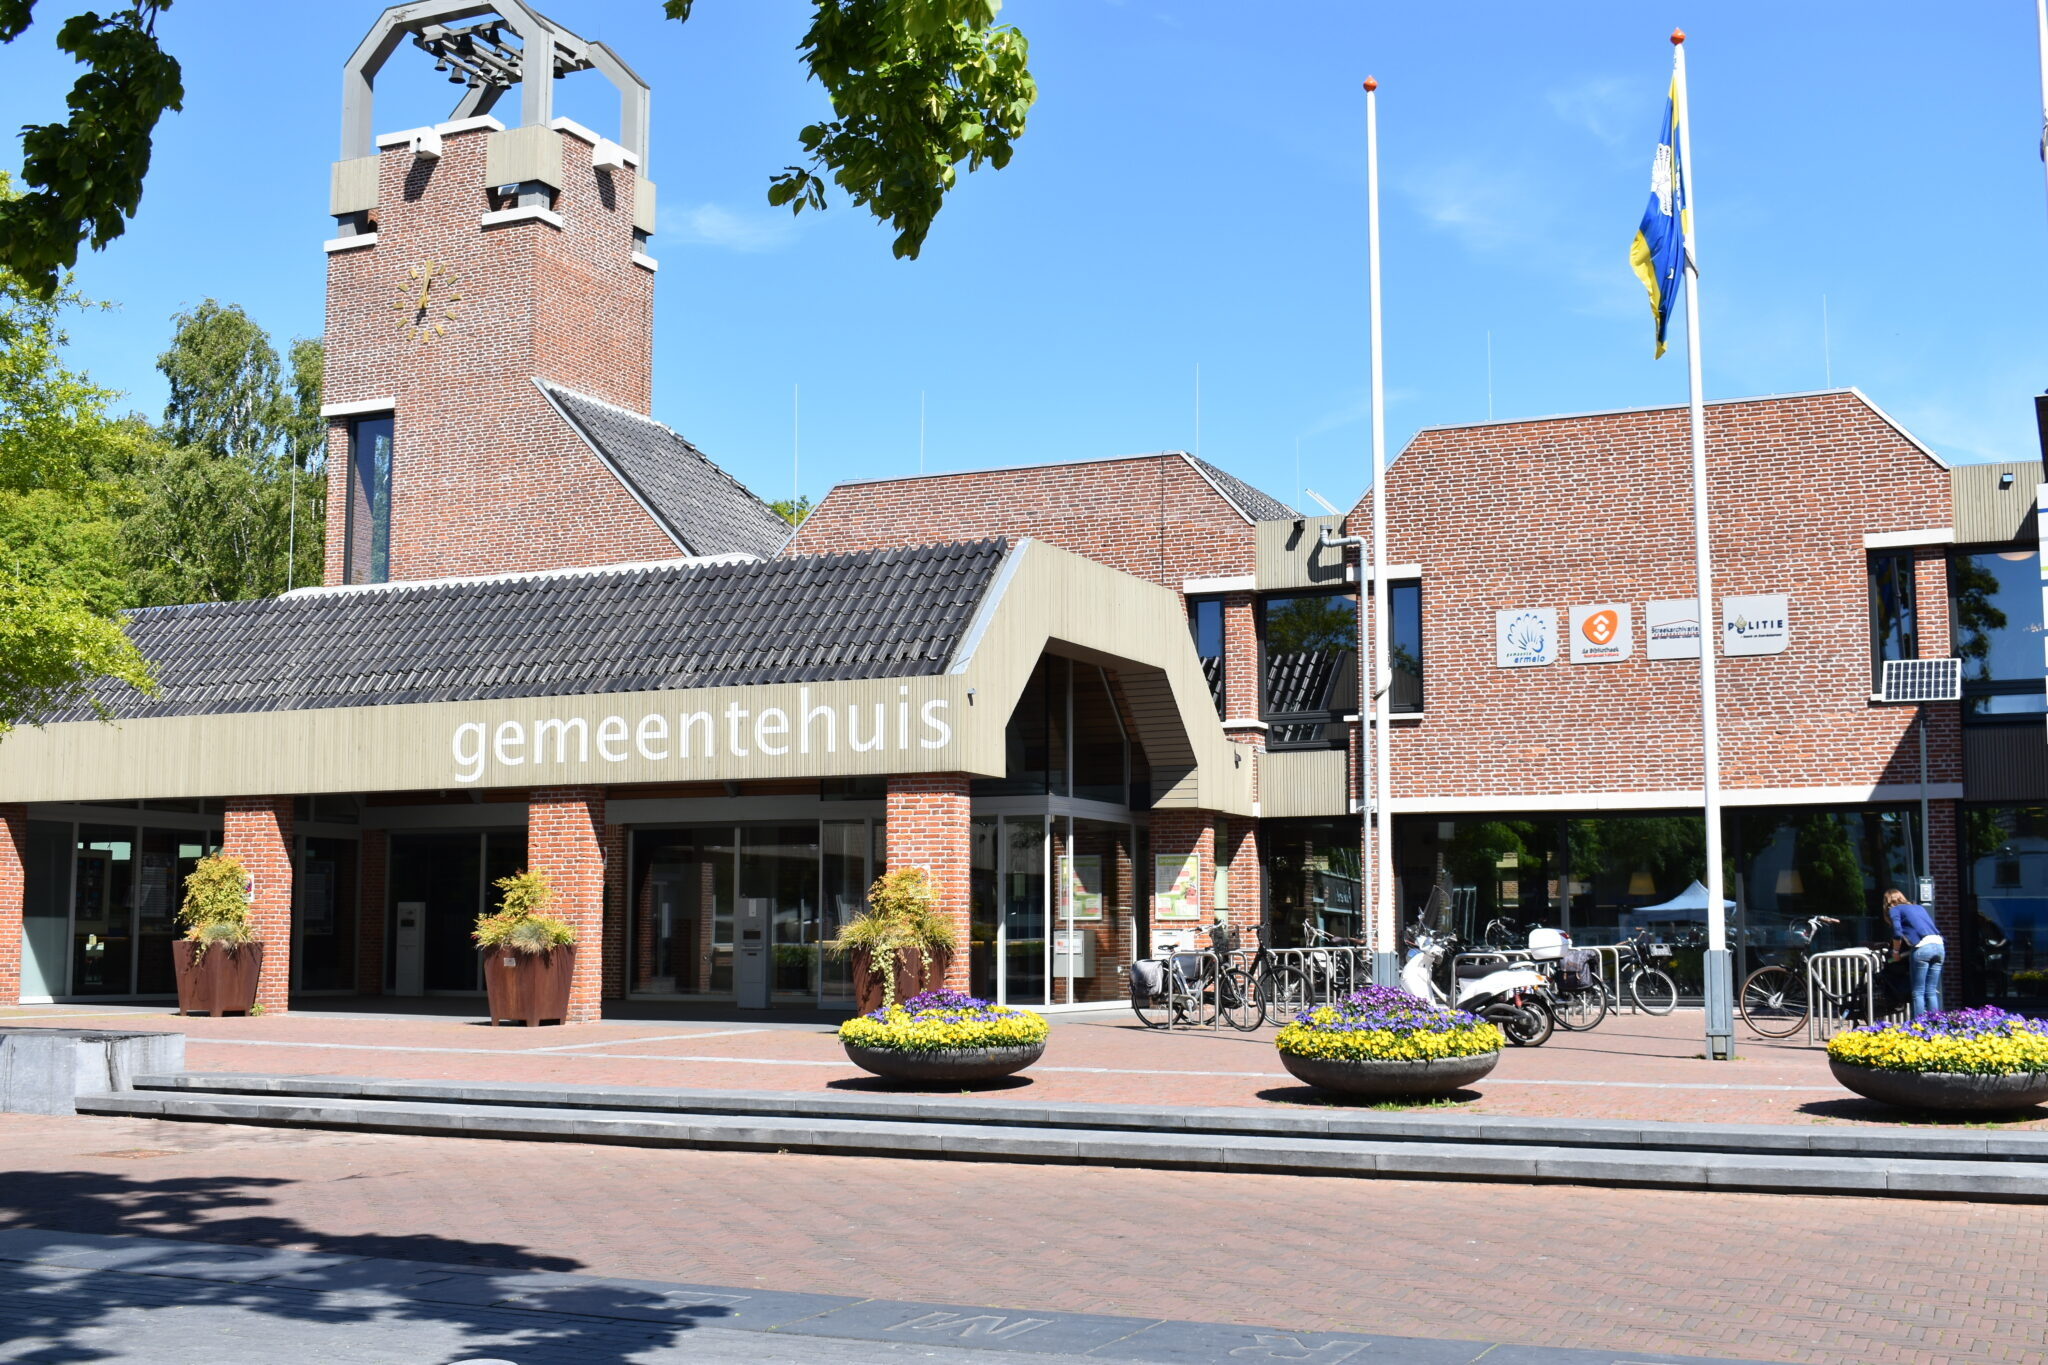 Gemeentehuis, Ermelo